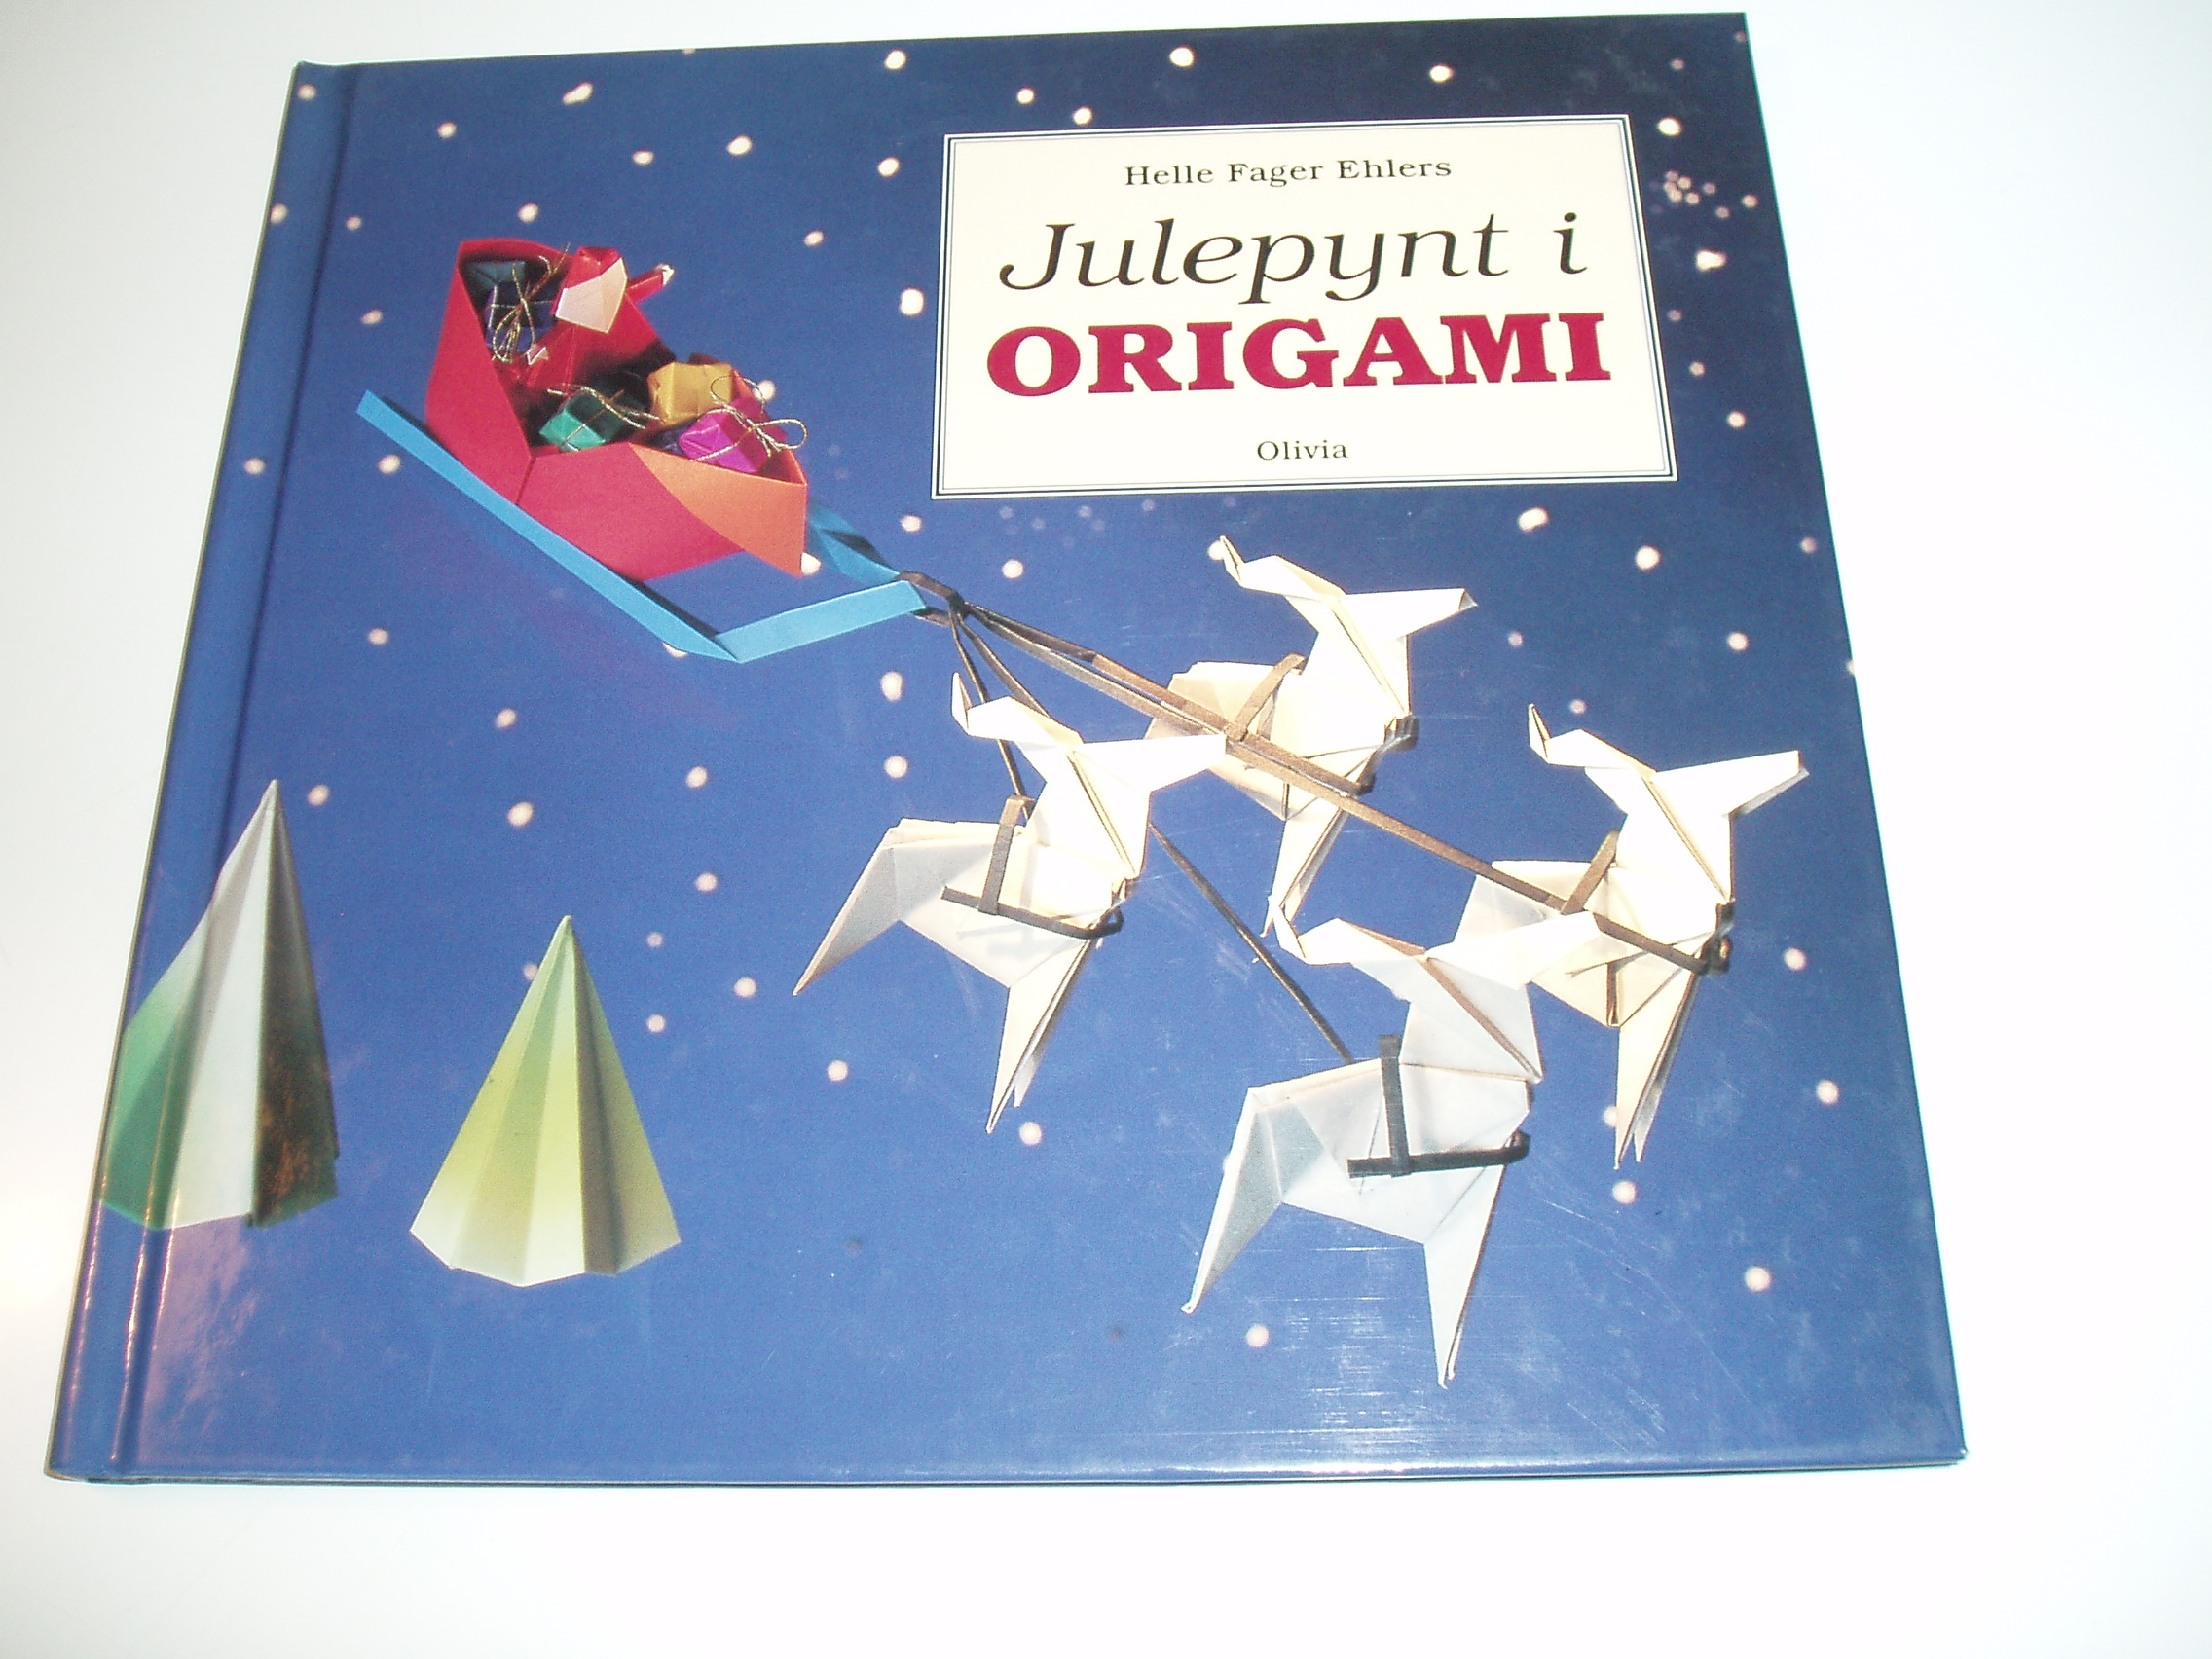 Julepynt i origami